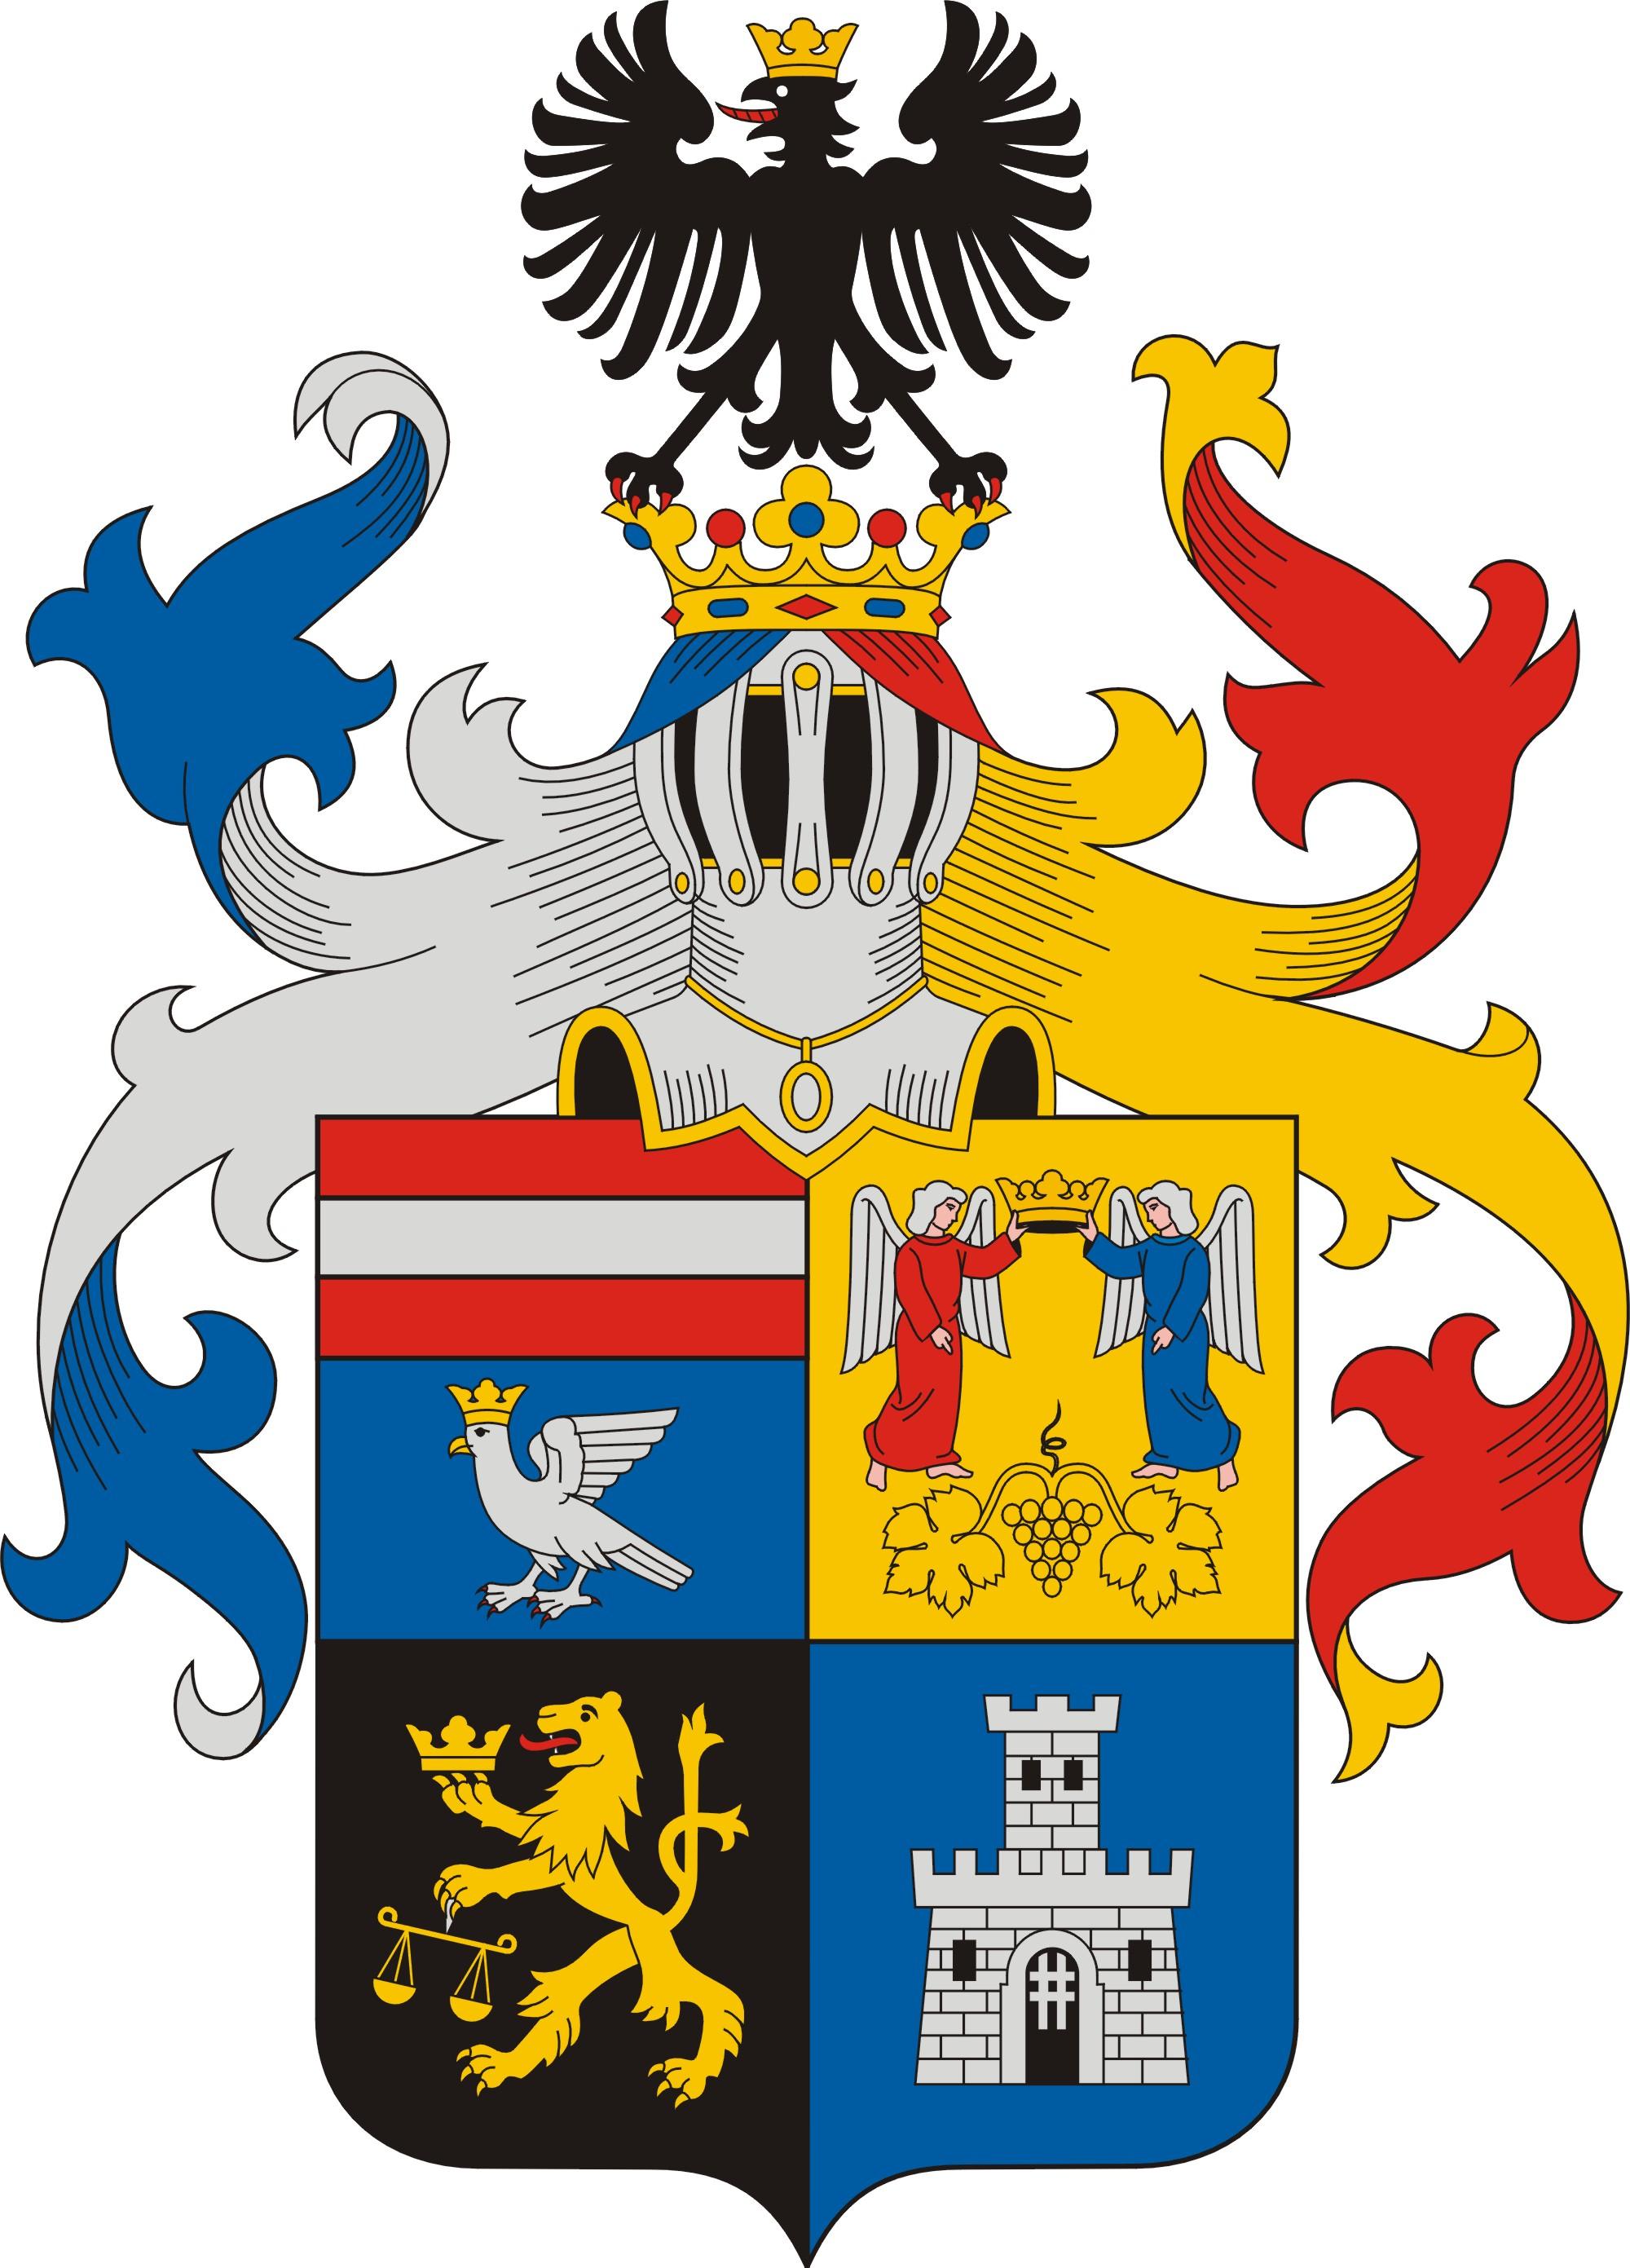 Borsod-Abaúj-Zemplén County   Familypedia   FANDOM powered ...